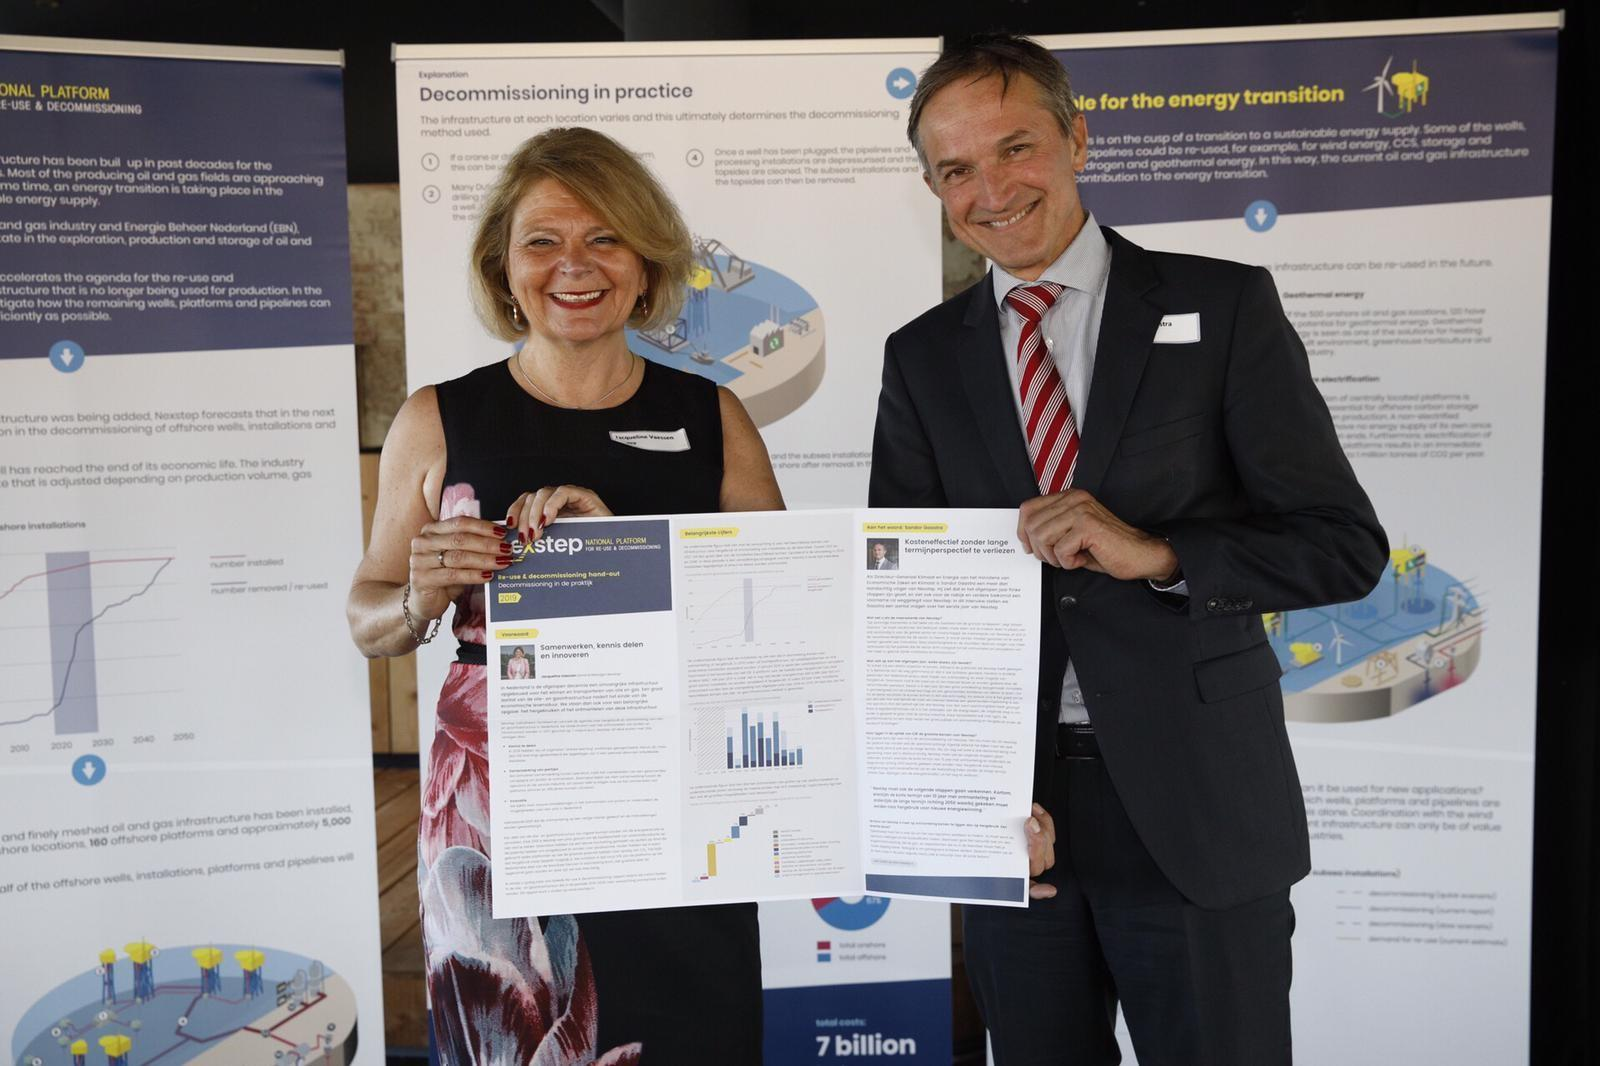 Re-use & decommissioning rapport 2019 gepresenteerd